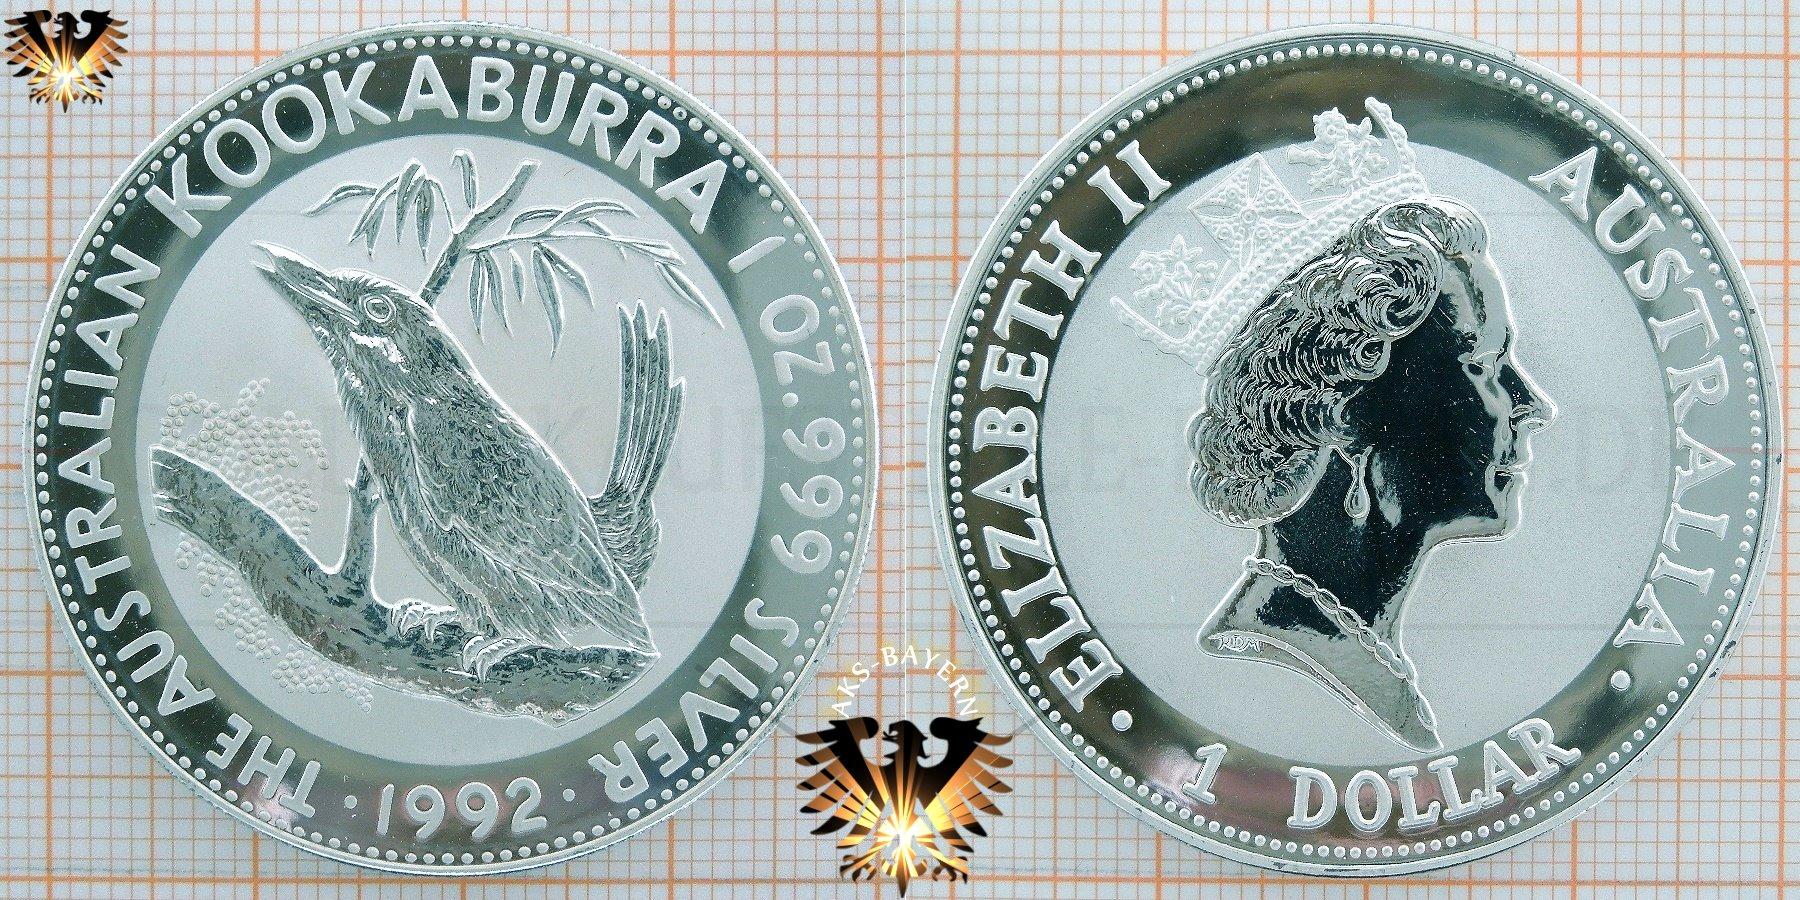 1 Dollar 1992 Anlagesilber Aus Australien Wert Zu 1 Unze Feinsilber